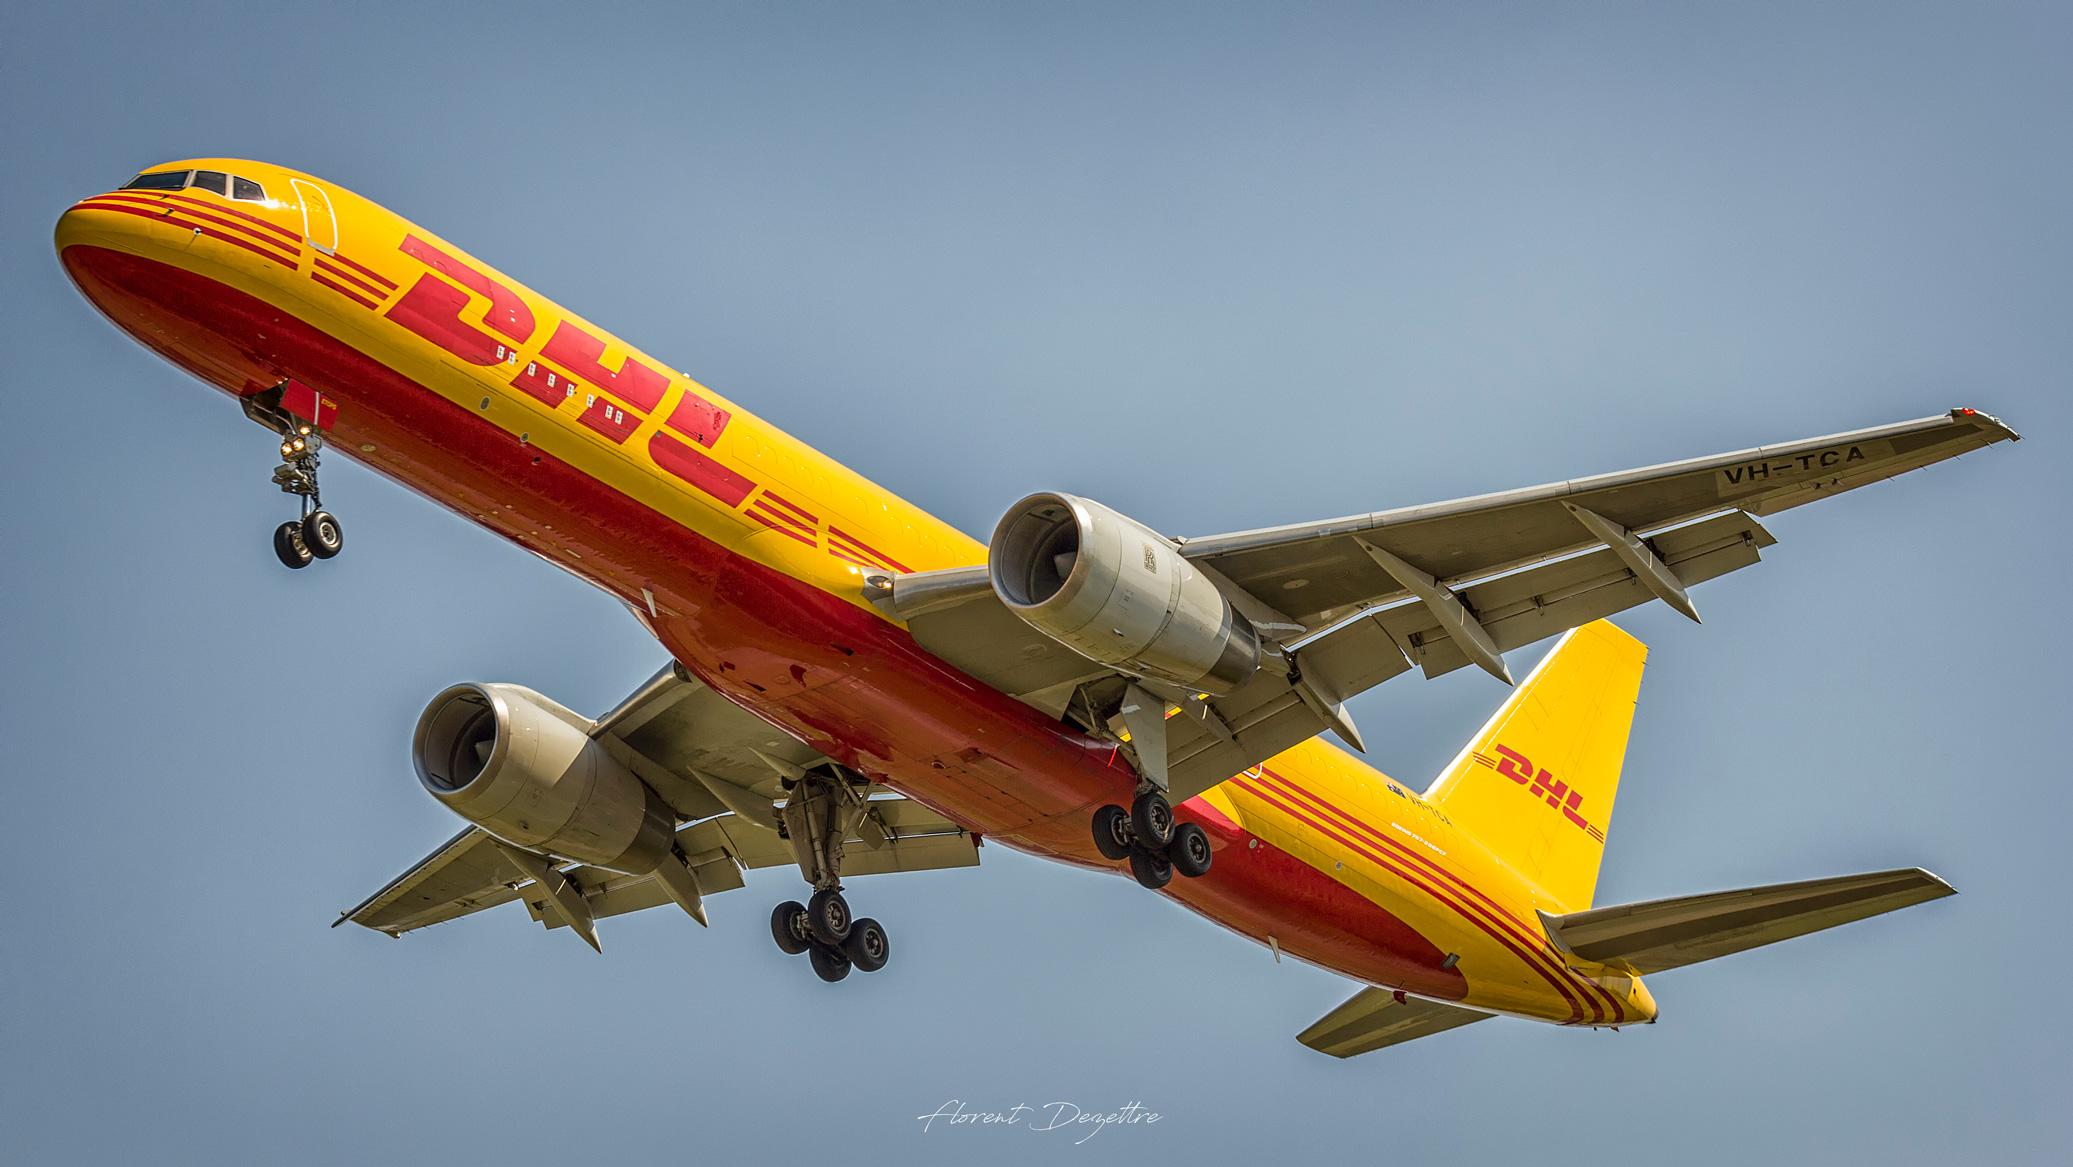 DHL-757